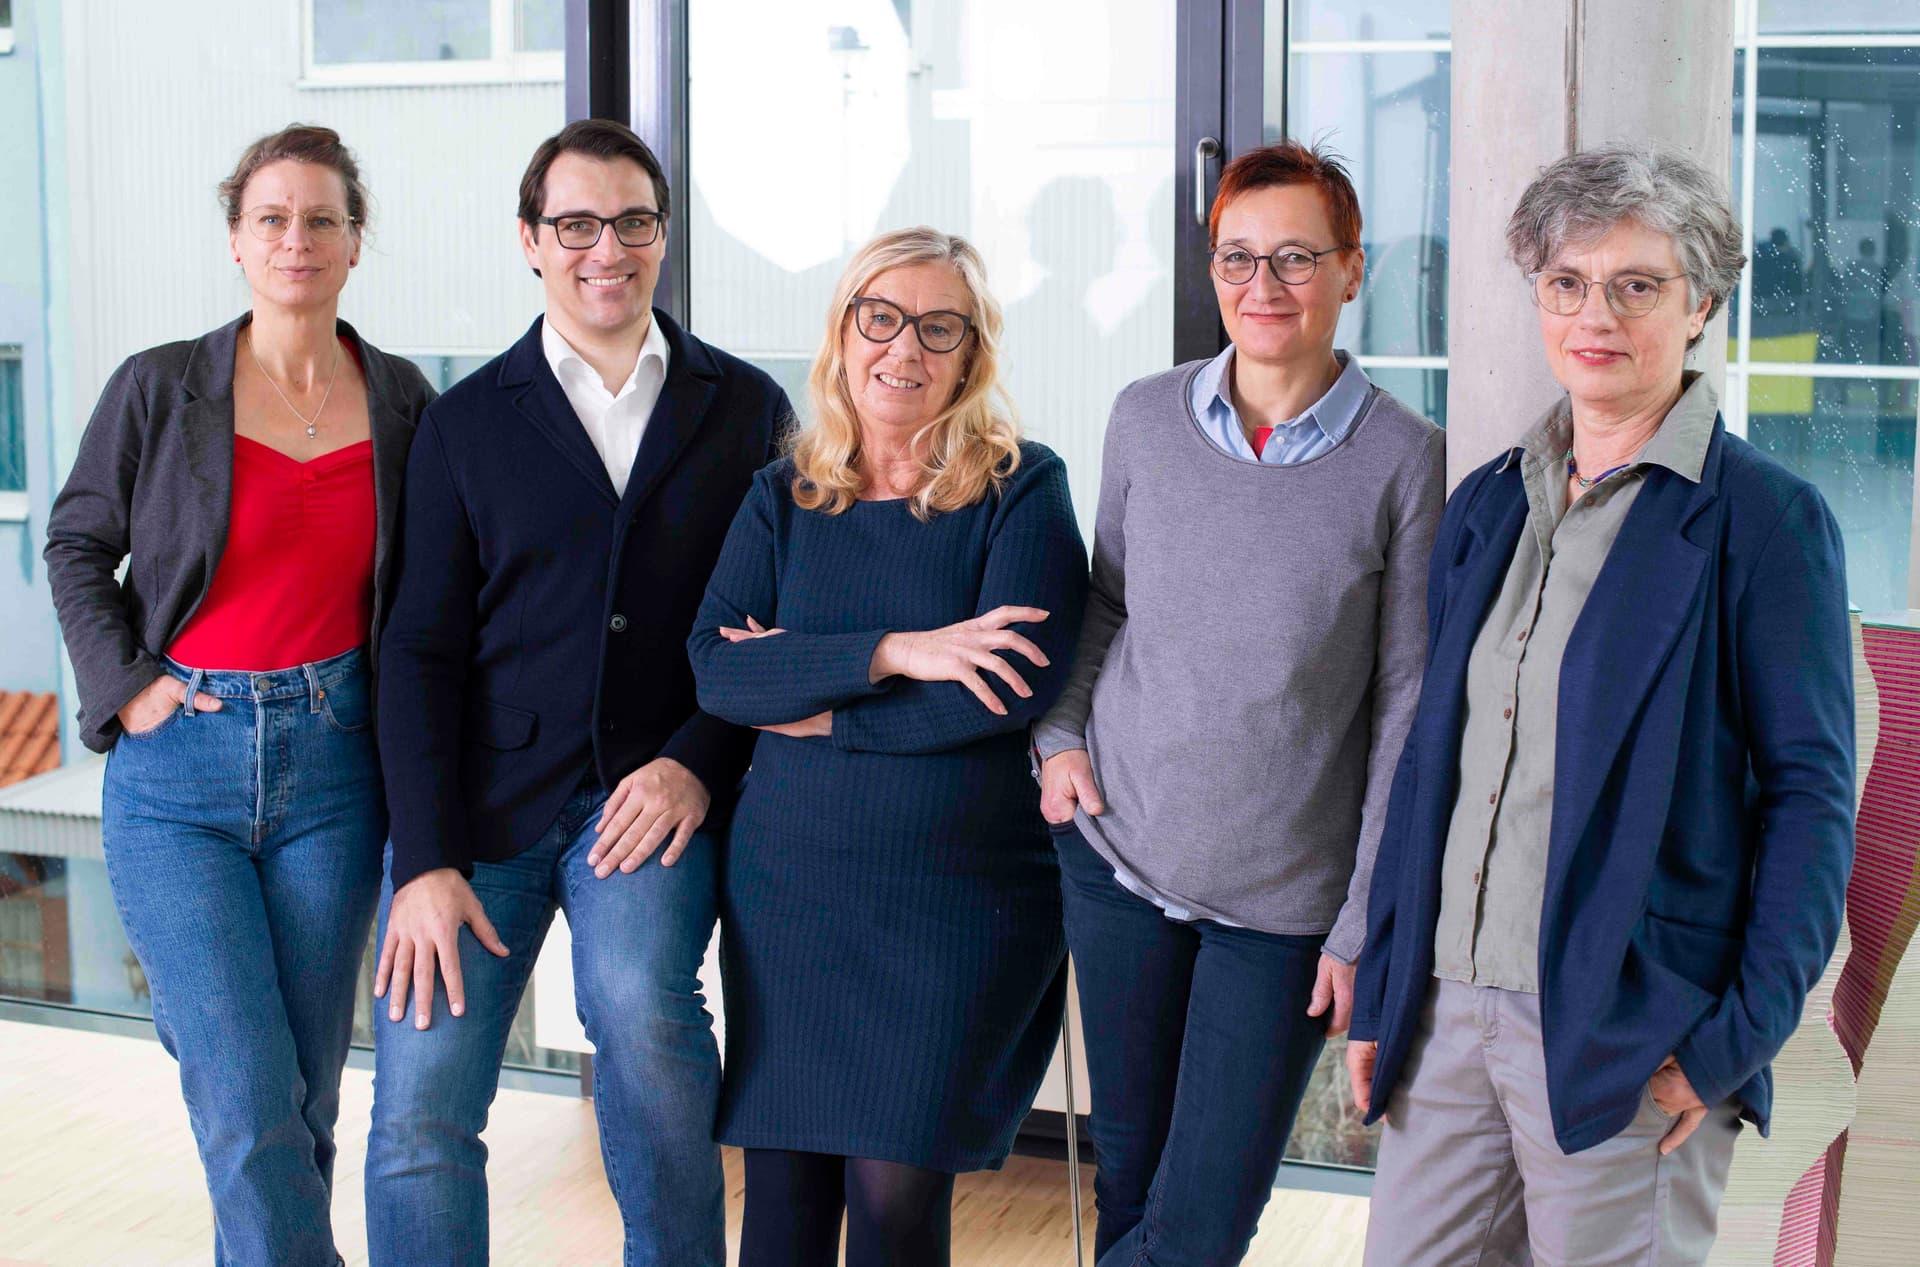 Stephanie Silber, Frederik Nurnus, oEllen Heil, Ulrike Fiedler, Sabine Kauffmann